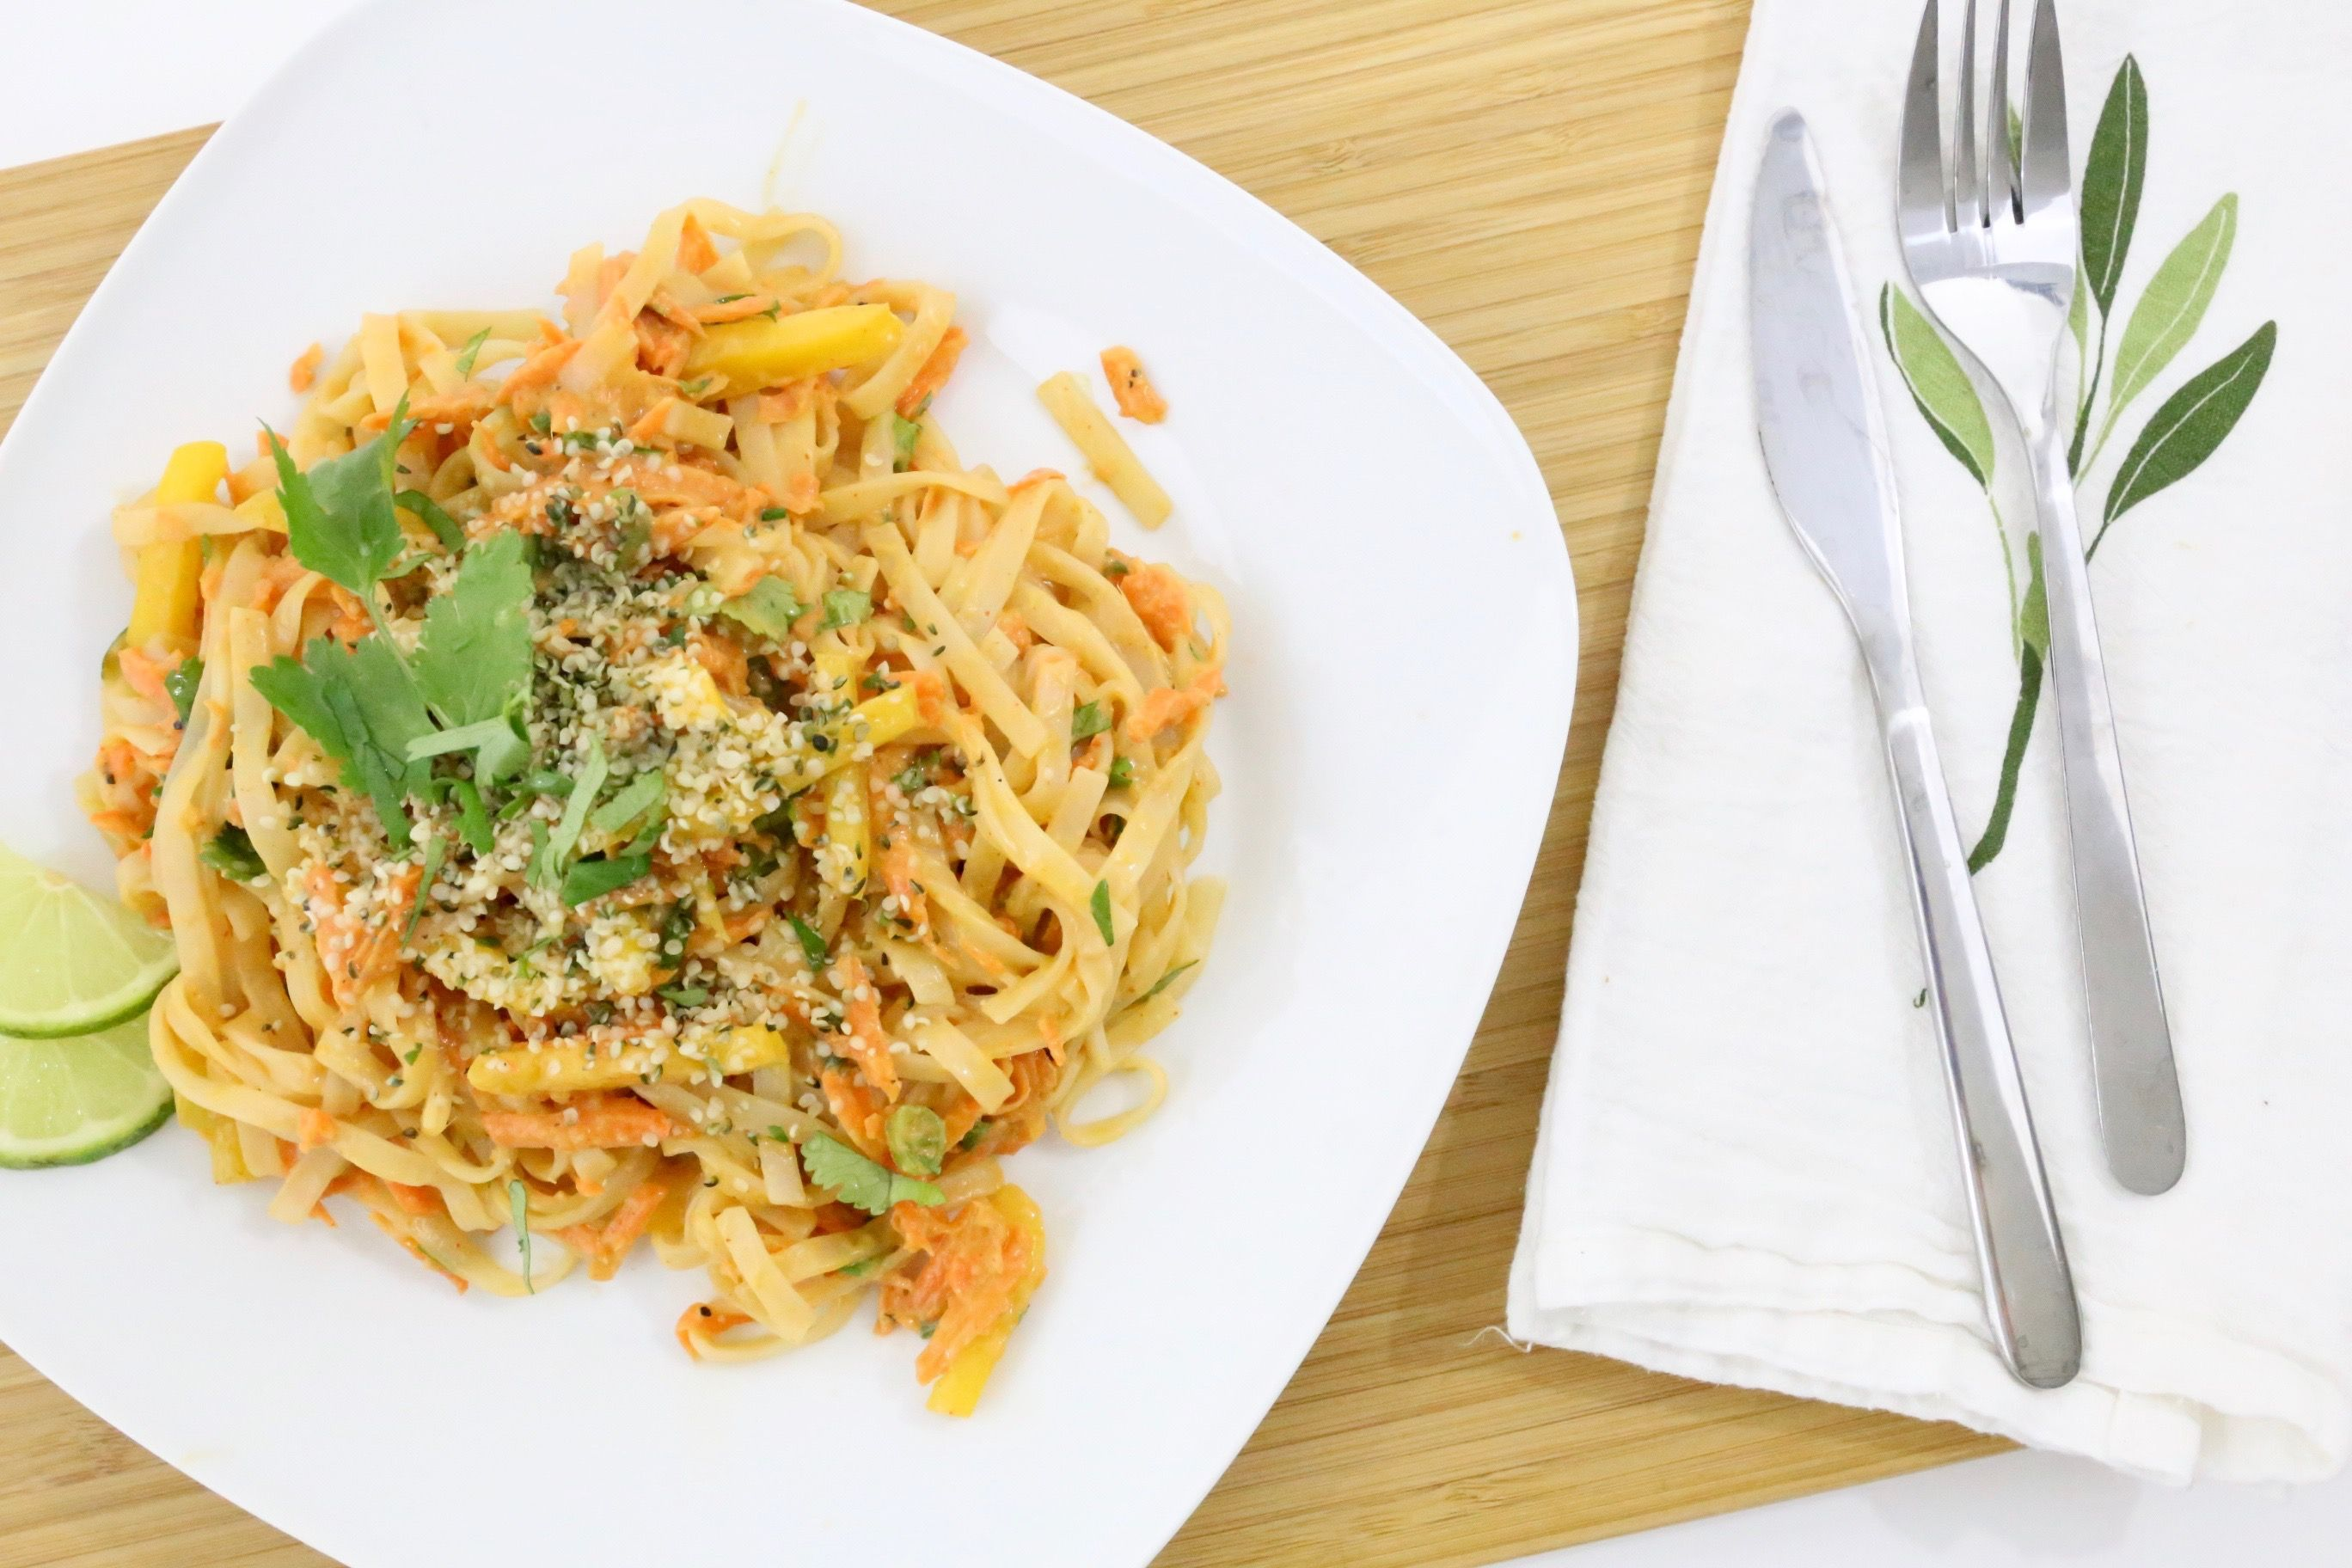 Chef's Plate Review - Peanut Pad Thai https://www.ayearofboxes.com/reviews/chefs-plate-review-peanut-pad-thai/